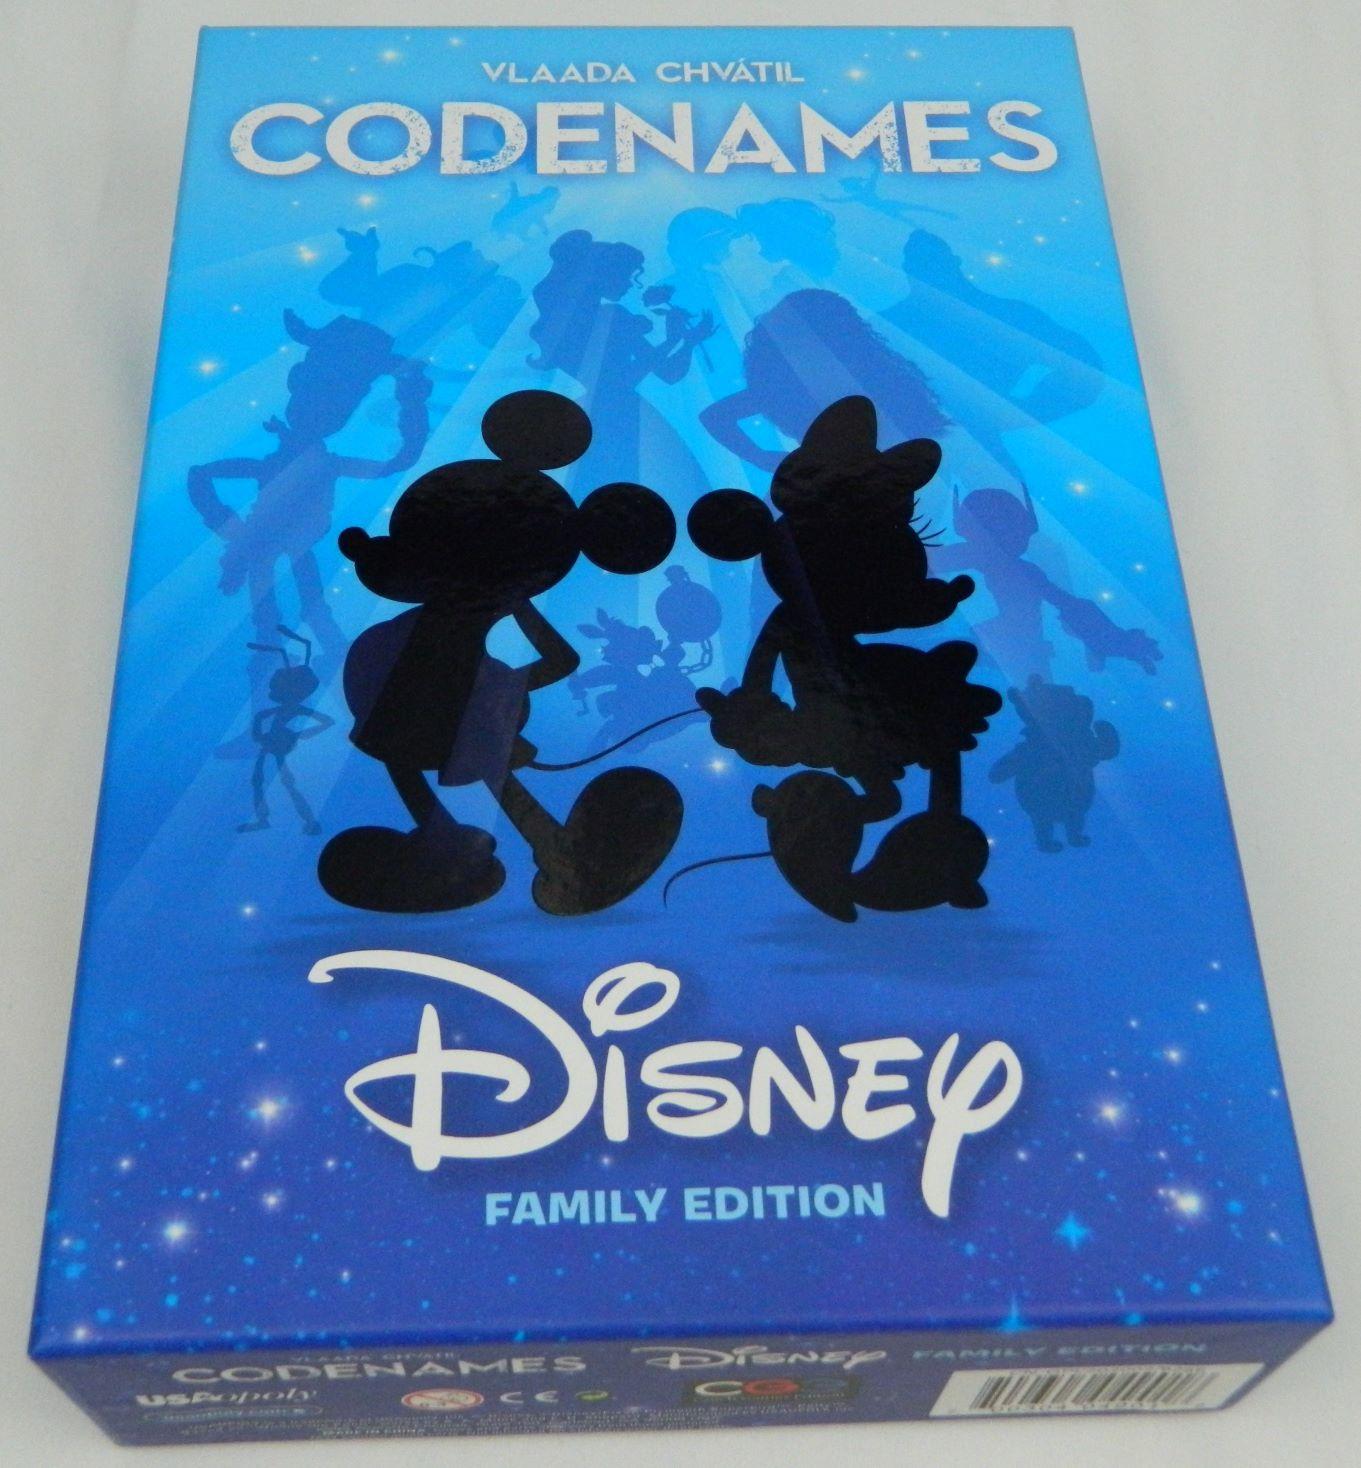 Box for Disney Codenamess